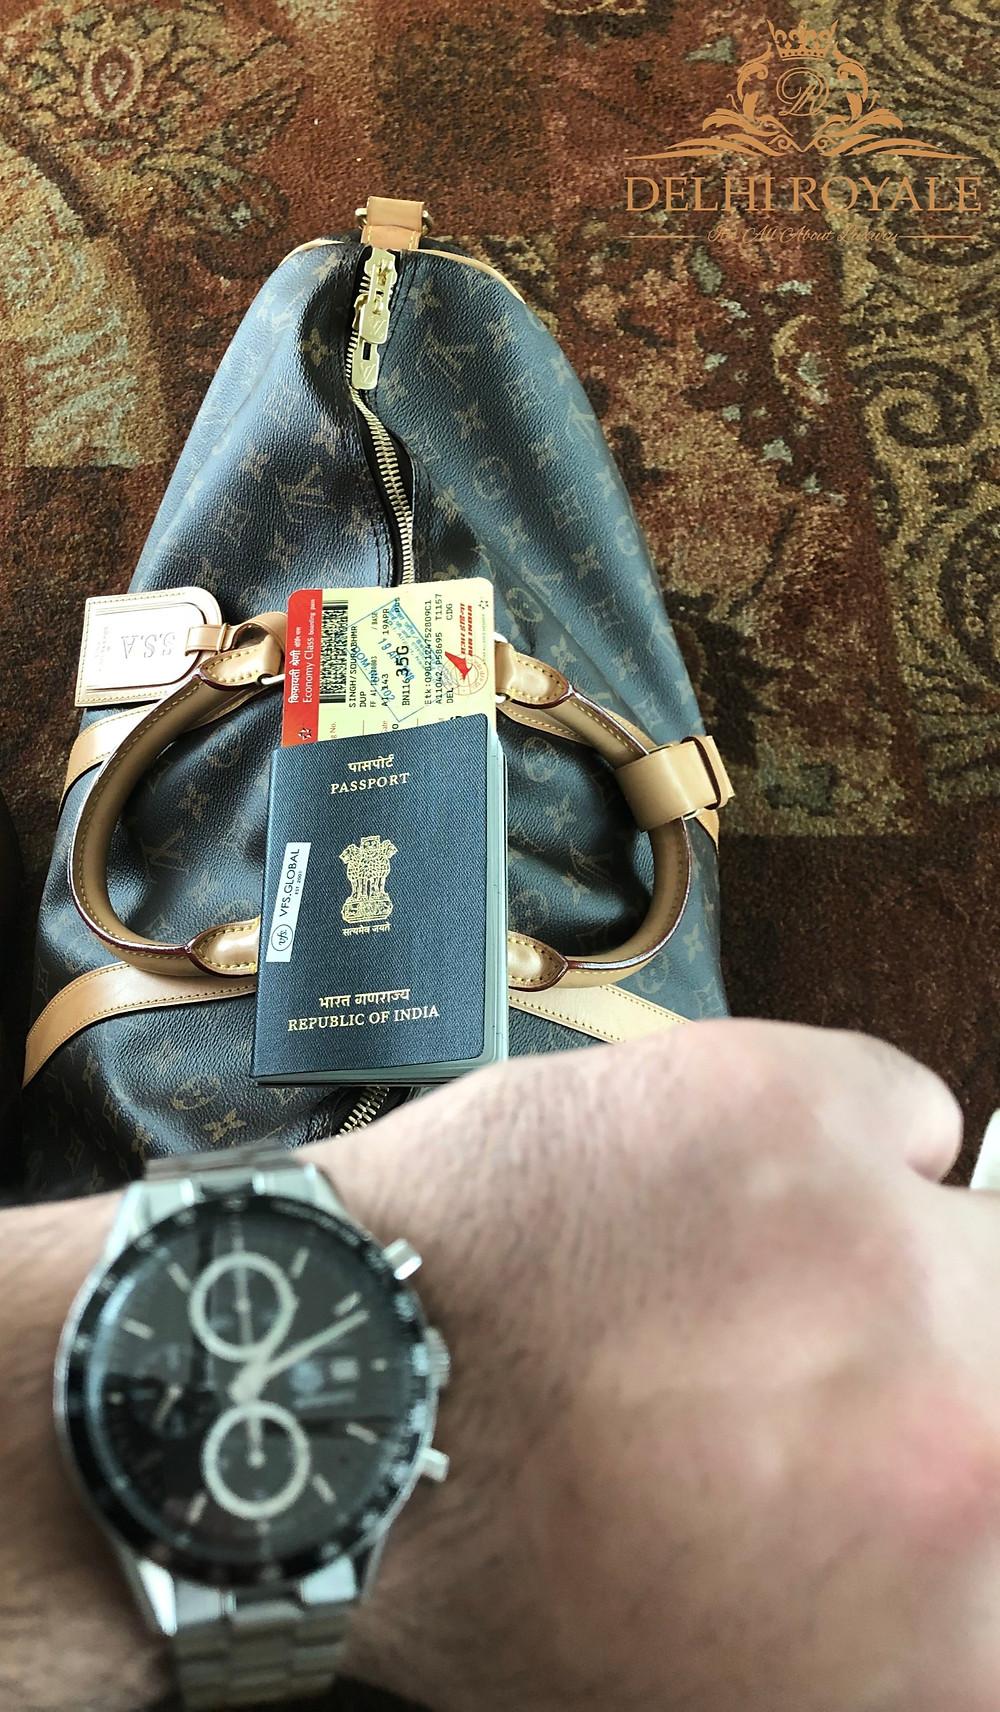 Louis Vuitton Keepall Bandoulière 55 luxury travelduffel bag